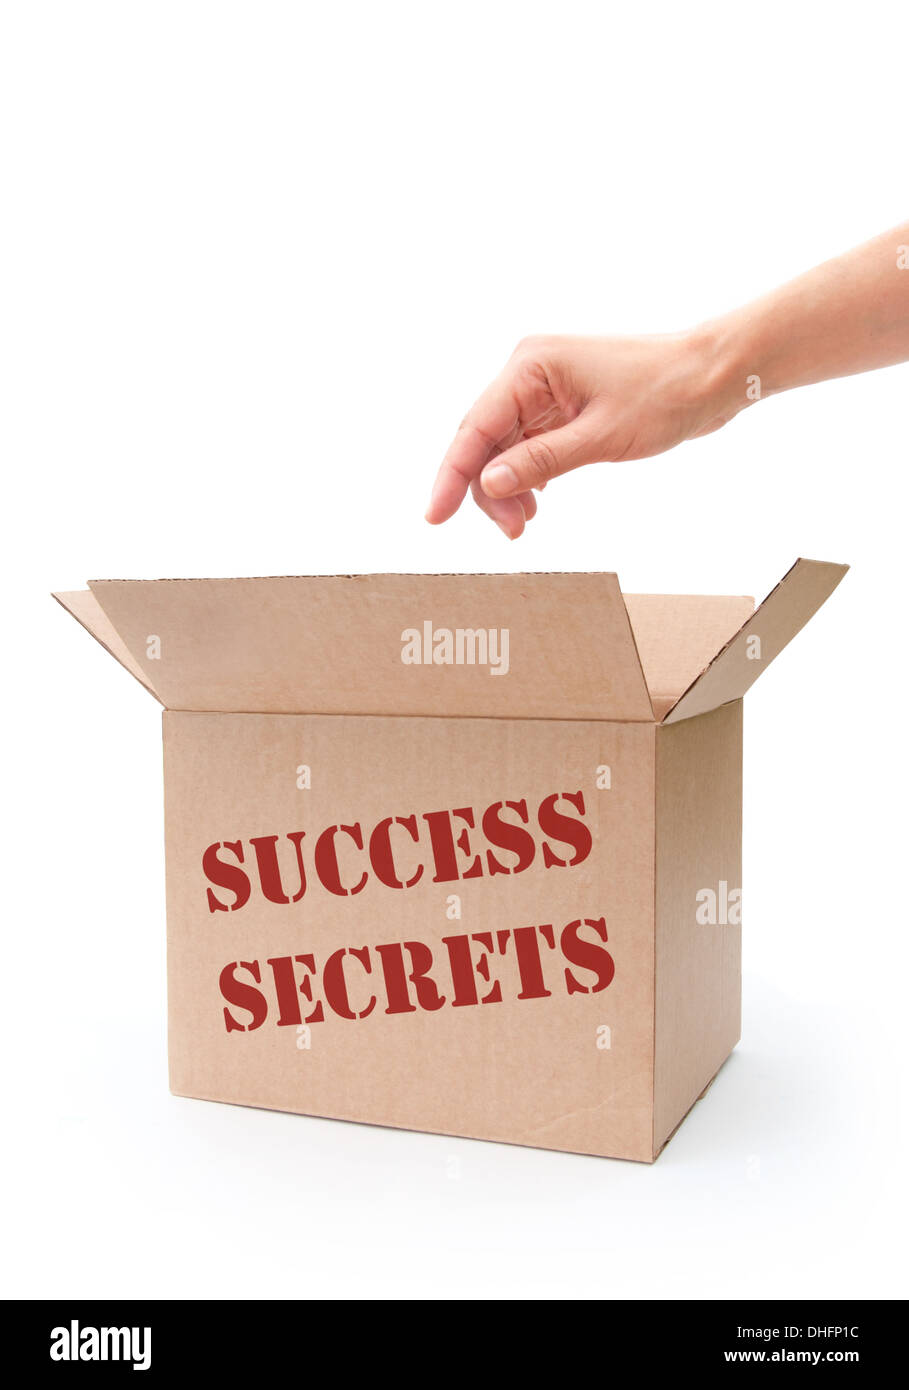 Secrets of success concept - Stock Image